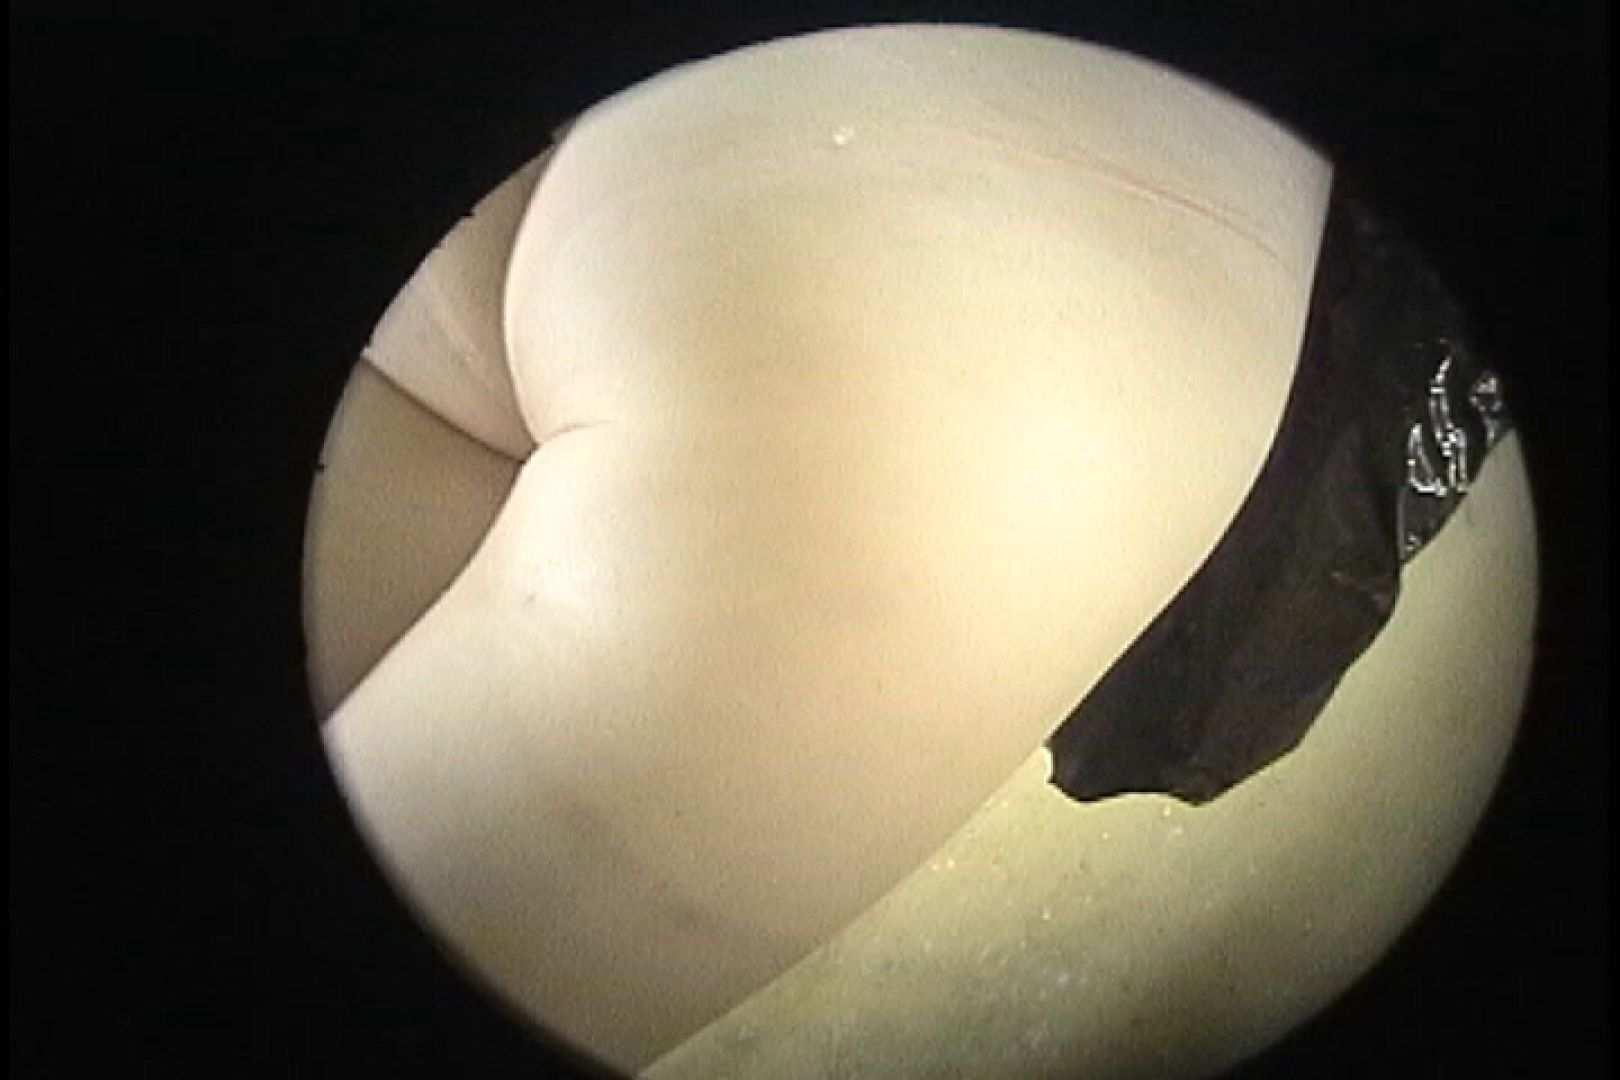 No.120 お尻の谷間に大きな具がこんにちわ! 垂れ乳 オマンコ動画キャプチャ 93枚 55